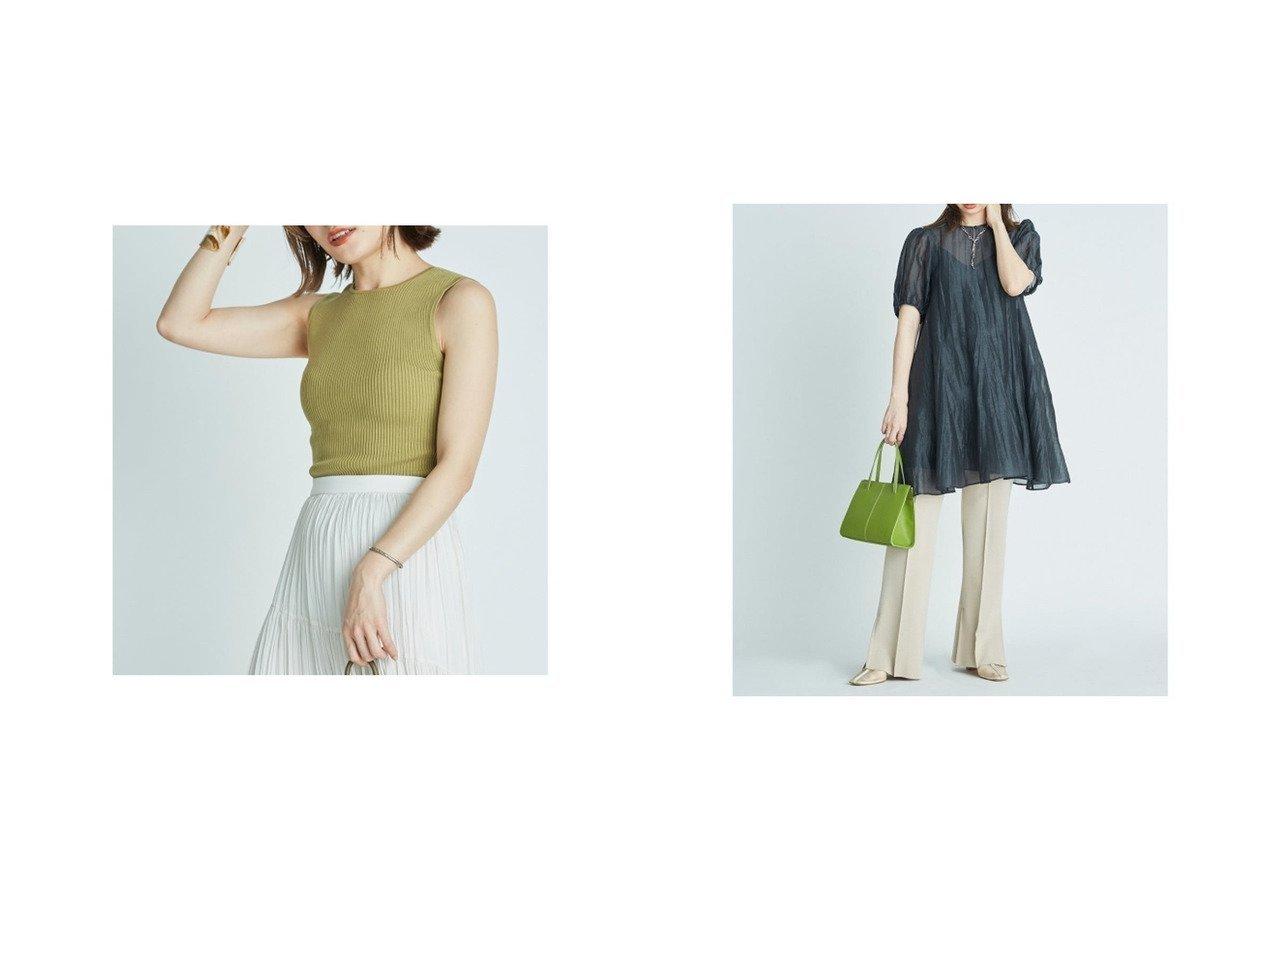 【FRAY I.D/フレイ アイディー】のパフスリーブフレアチュニックブラウス&バックストリングニットプルオーバー 【トップス・カットソー】おすすめ!人気、トレンド・レディースファッションの通販 おすすめで人気の流行・トレンド、ファッションの通販商品 インテリア・家具・メンズファッション・キッズファッション・レディースファッション・服の通販 founy(ファニー) https://founy.com/ ファッション Fashion レディースファッション WOMEN トップス・カットソー Tops/Tshirt ニット Knit Tops プルオーバー Pullover シャツ/ブラウス Shirts/Blouses 春 Spring シルク シンプル ストリング スマート フィット フロント ボトム リネン ワイド 2021年 2021 S/S・春夏 SS・Spring/Summer 2021春夏・S/S SS/Spring/Summer/2021 夏 Summer |ID:crp329100000054654